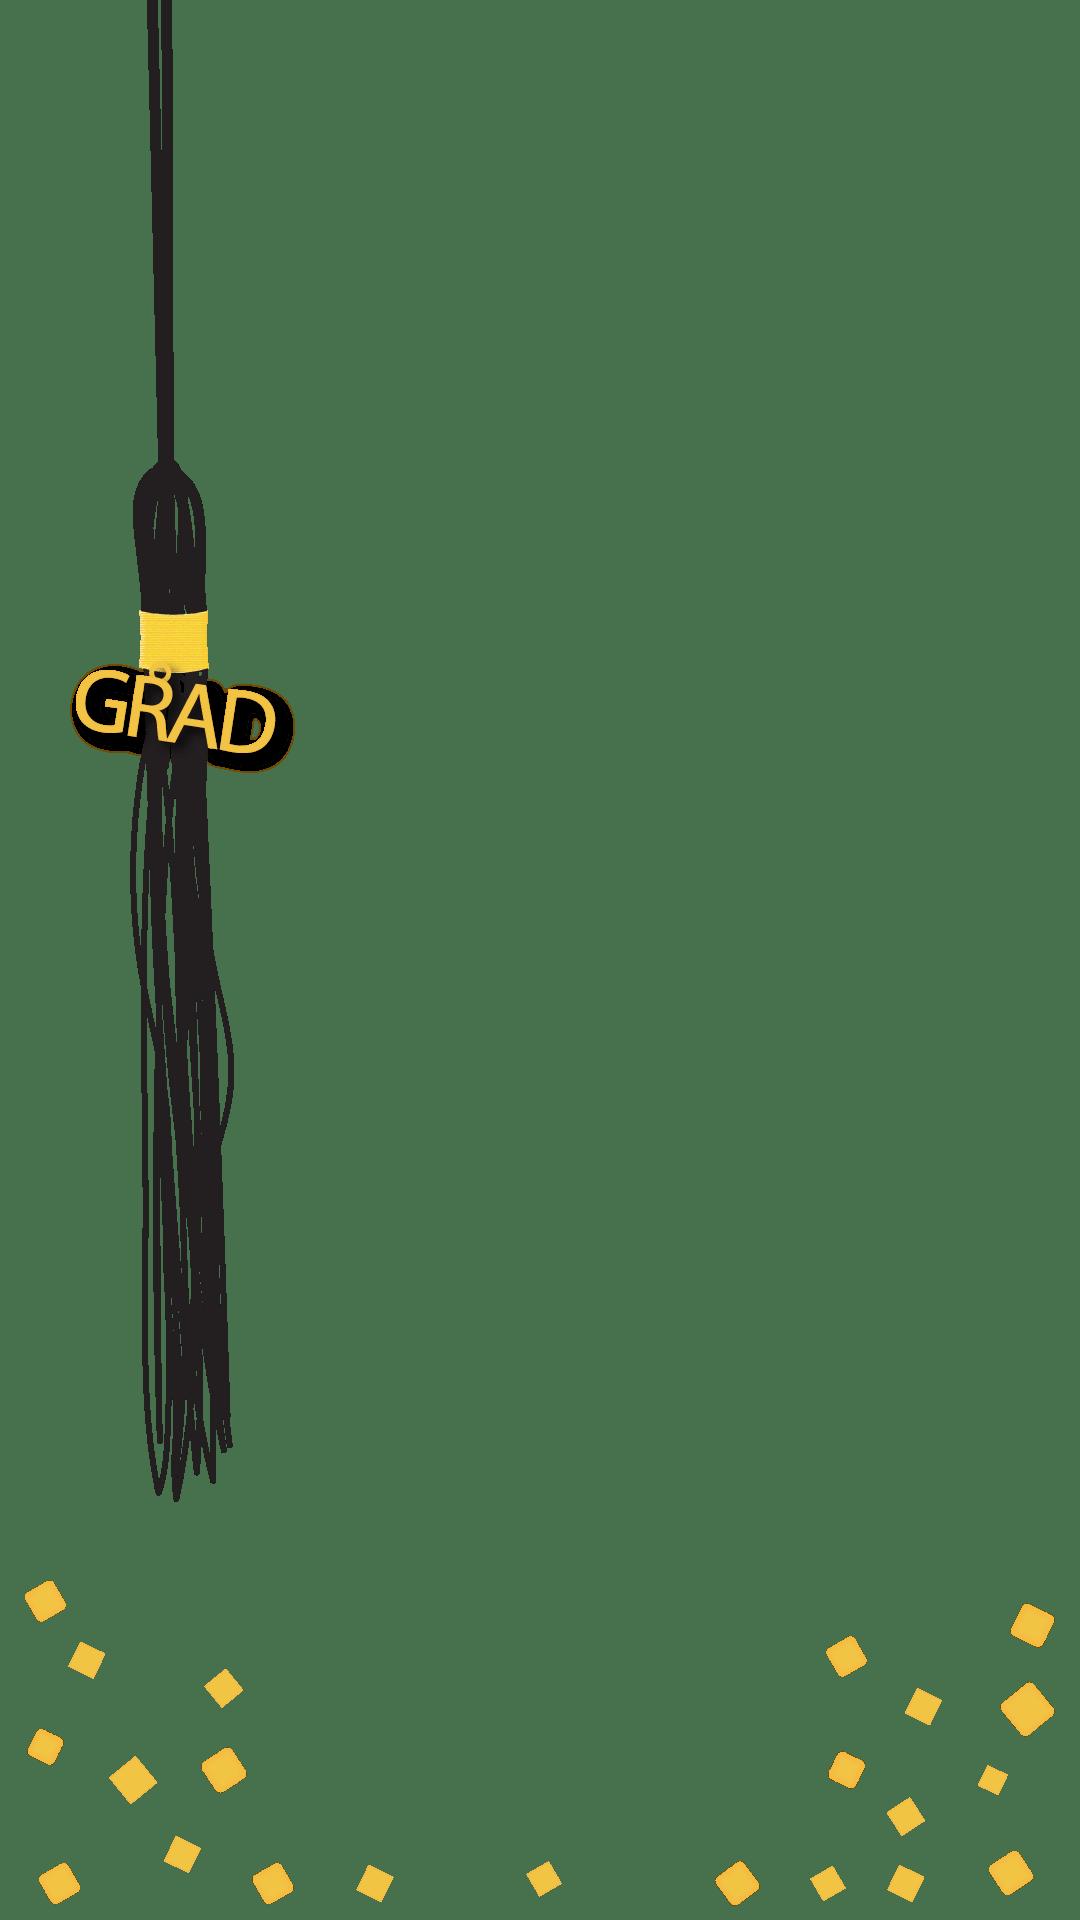 Graduation Geofilter